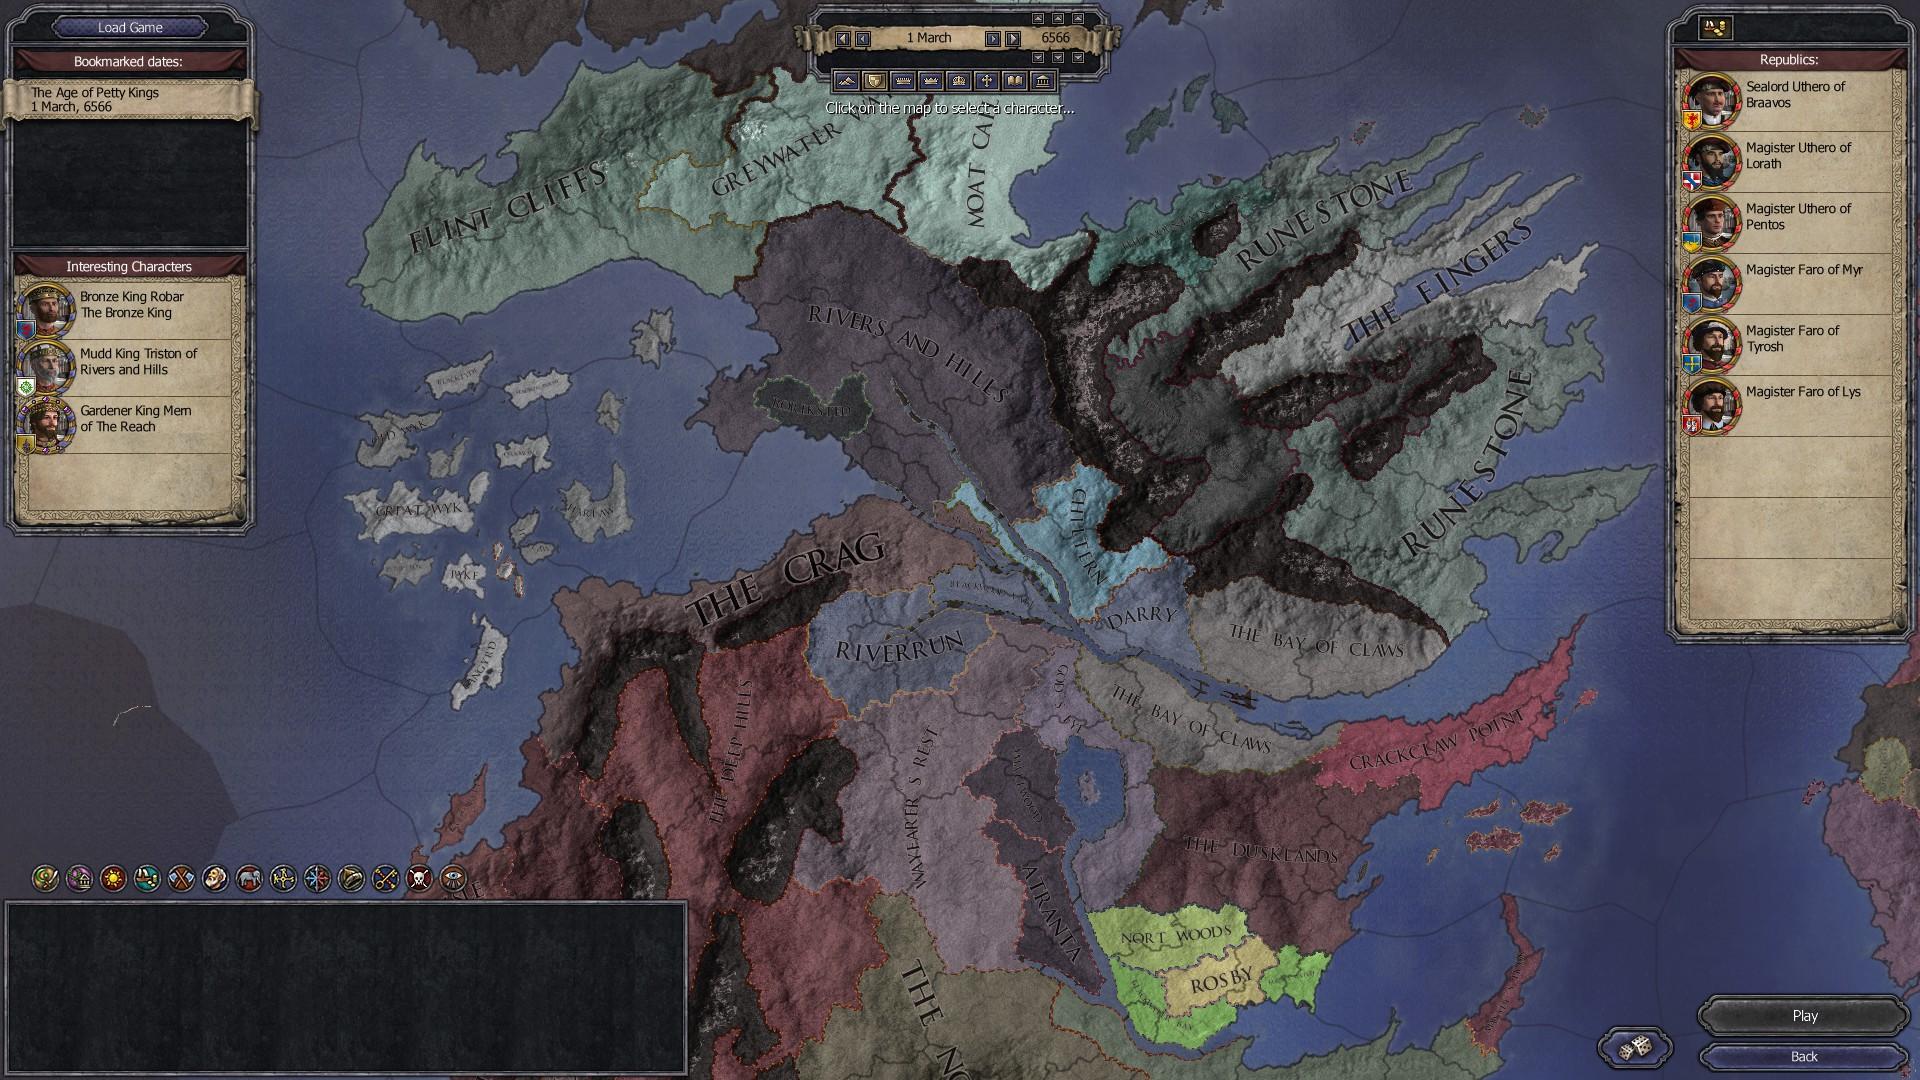 Crusader kings 2 game of thrones essos submod